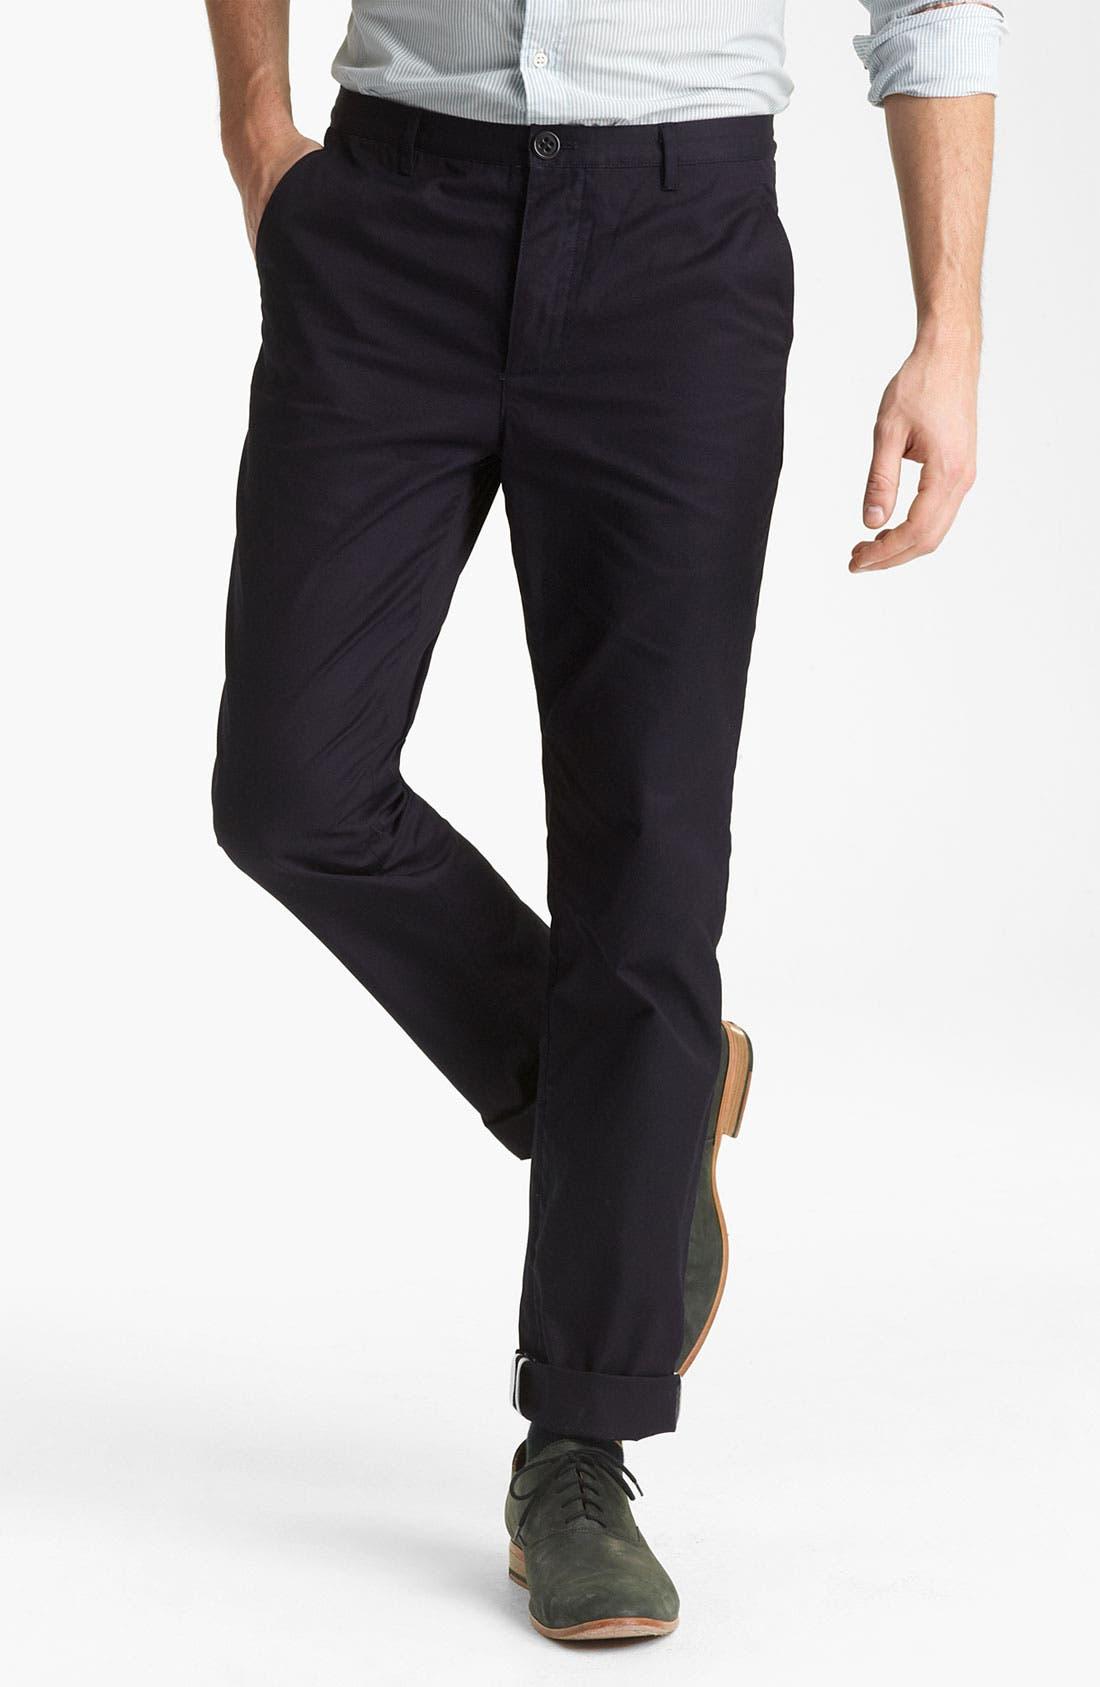 Alternate Image 1 Selected - Shipley & Halmos 'Belmont' Slim Fit Cotton Pants